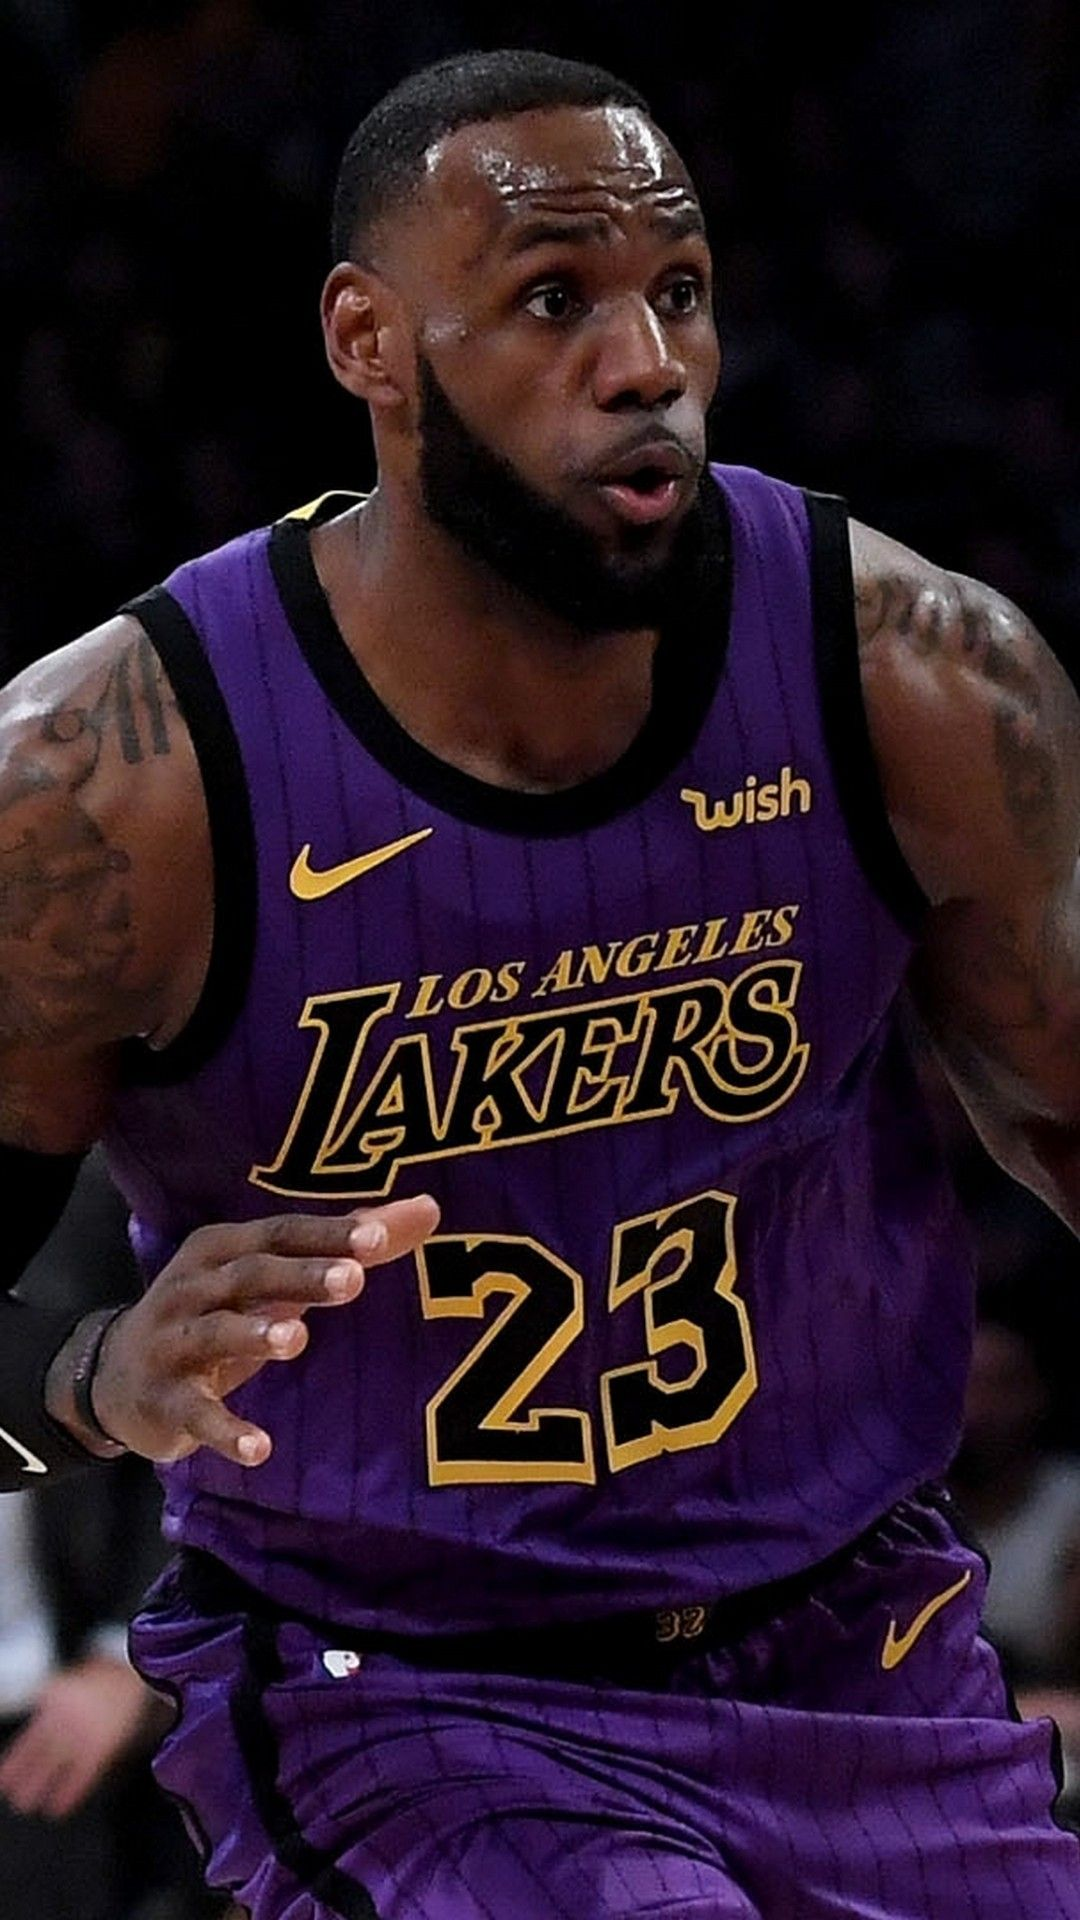 Basketball Wallpaper Best Basketball Wallpapers 2020 Lakers Wallpaper Lebron James Wallpapers Lebron James Lakers